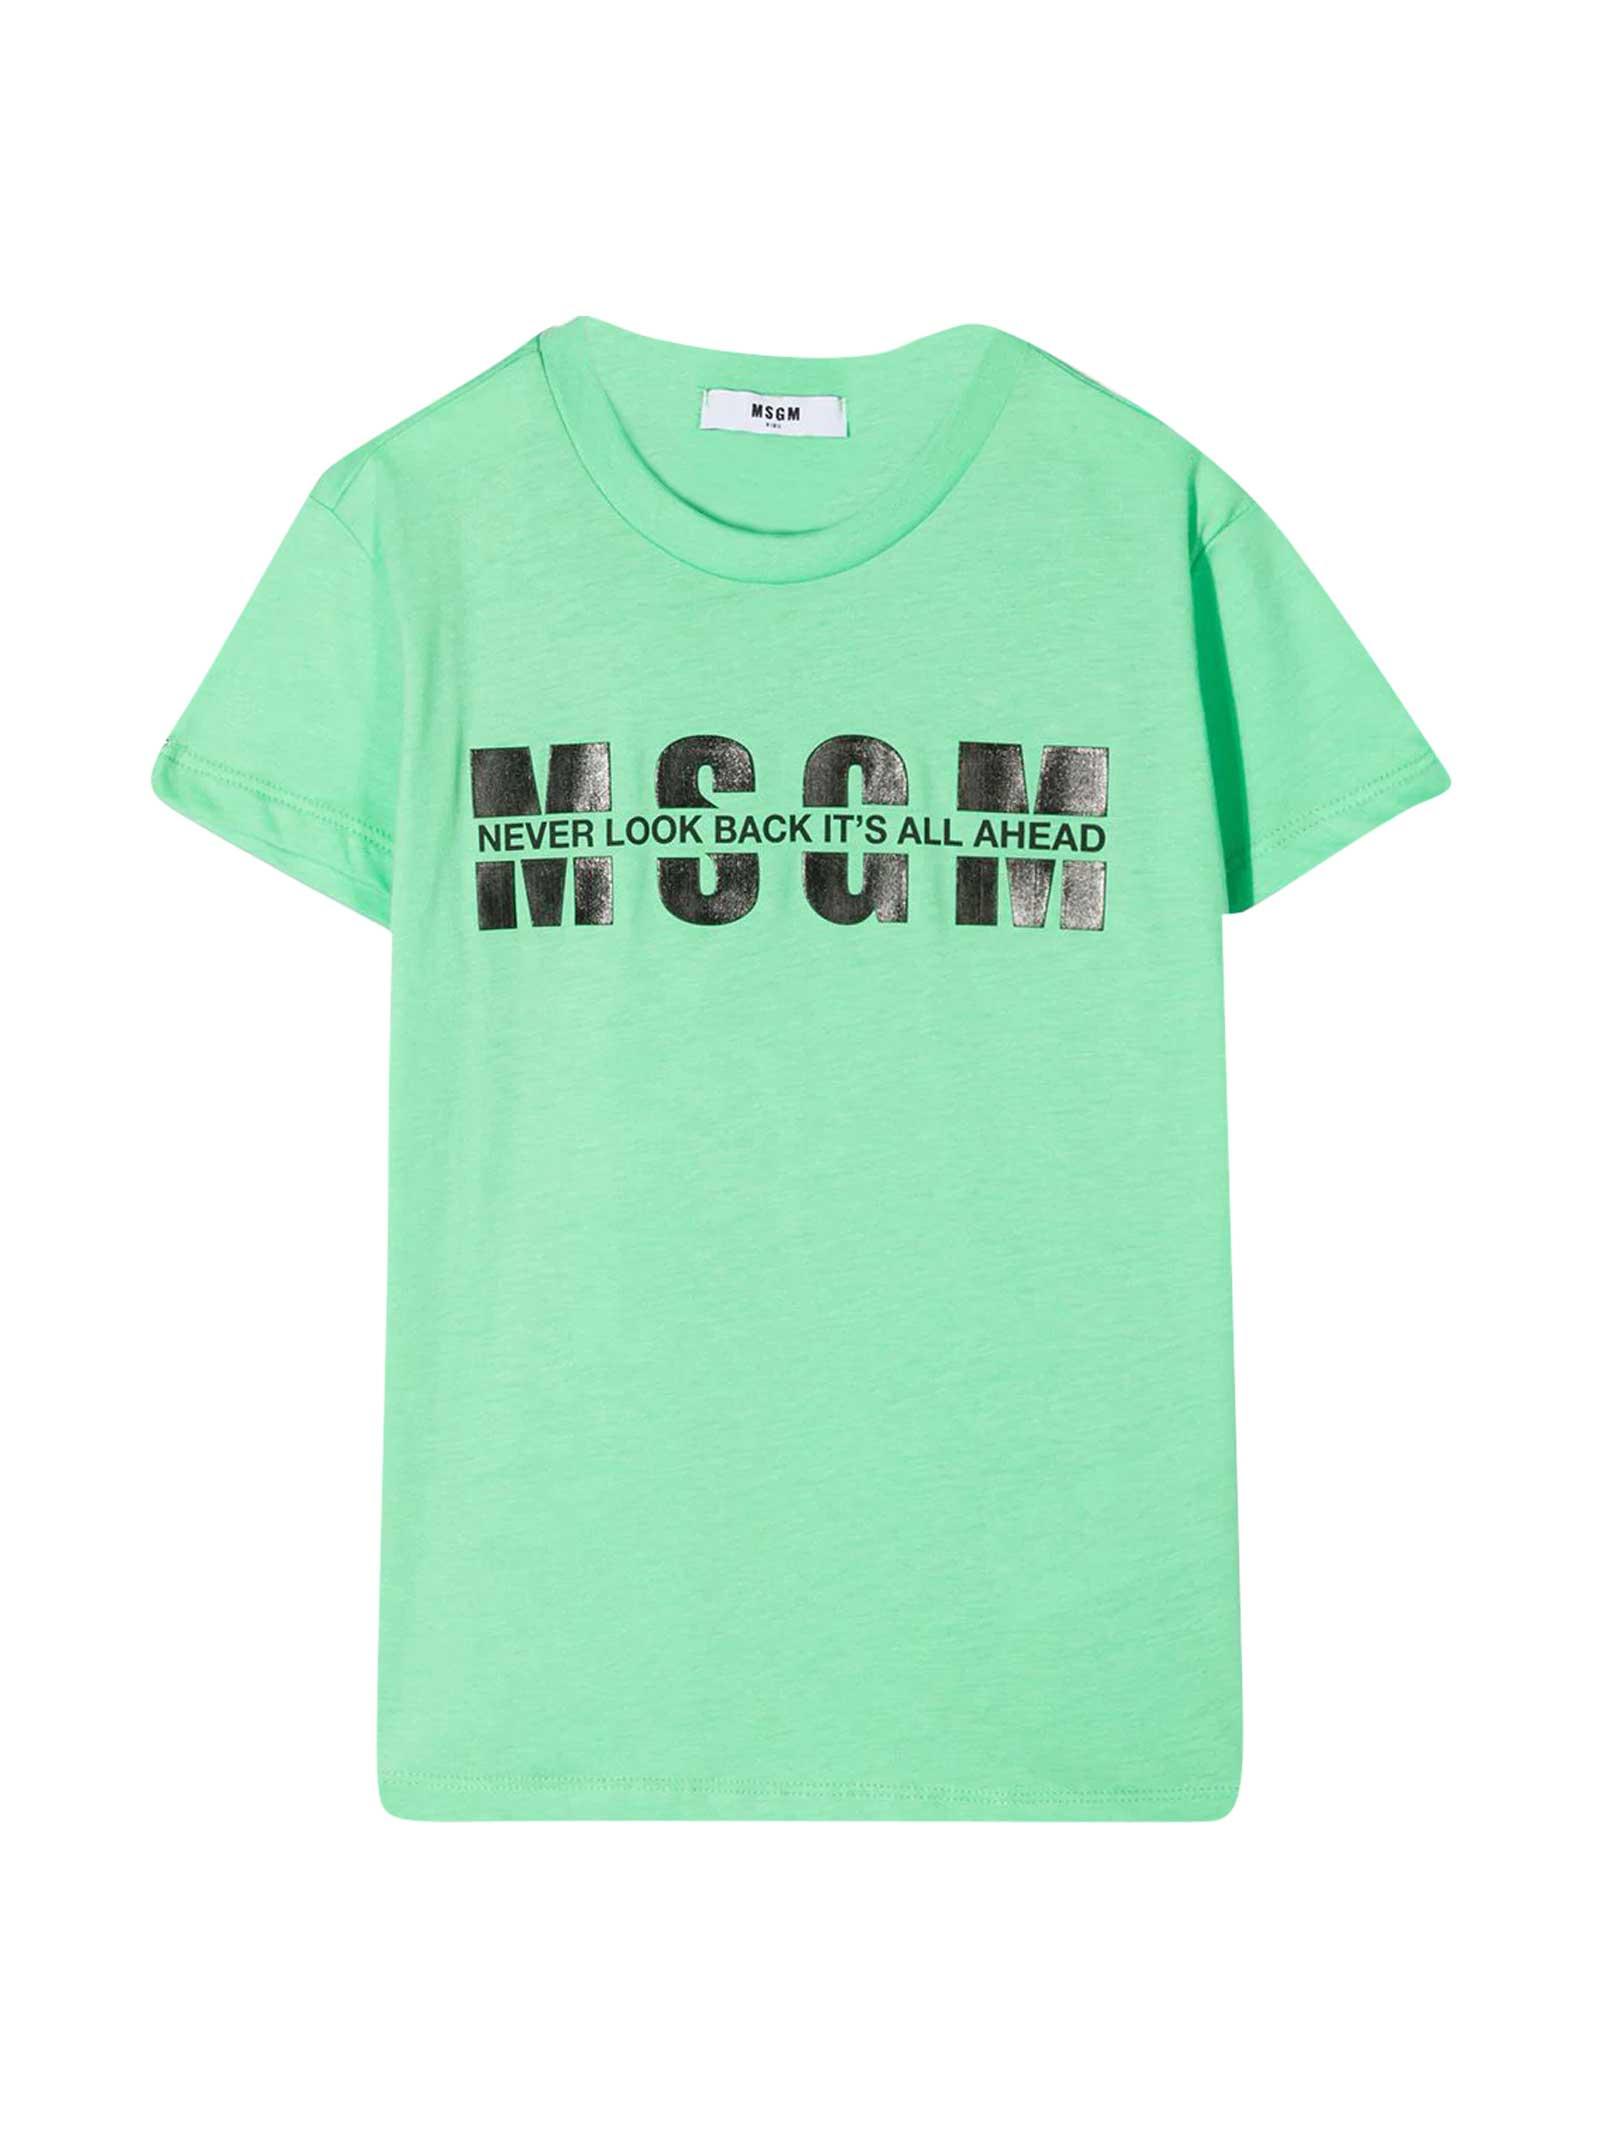 Msgm GREEN TEEN T-SHIRT